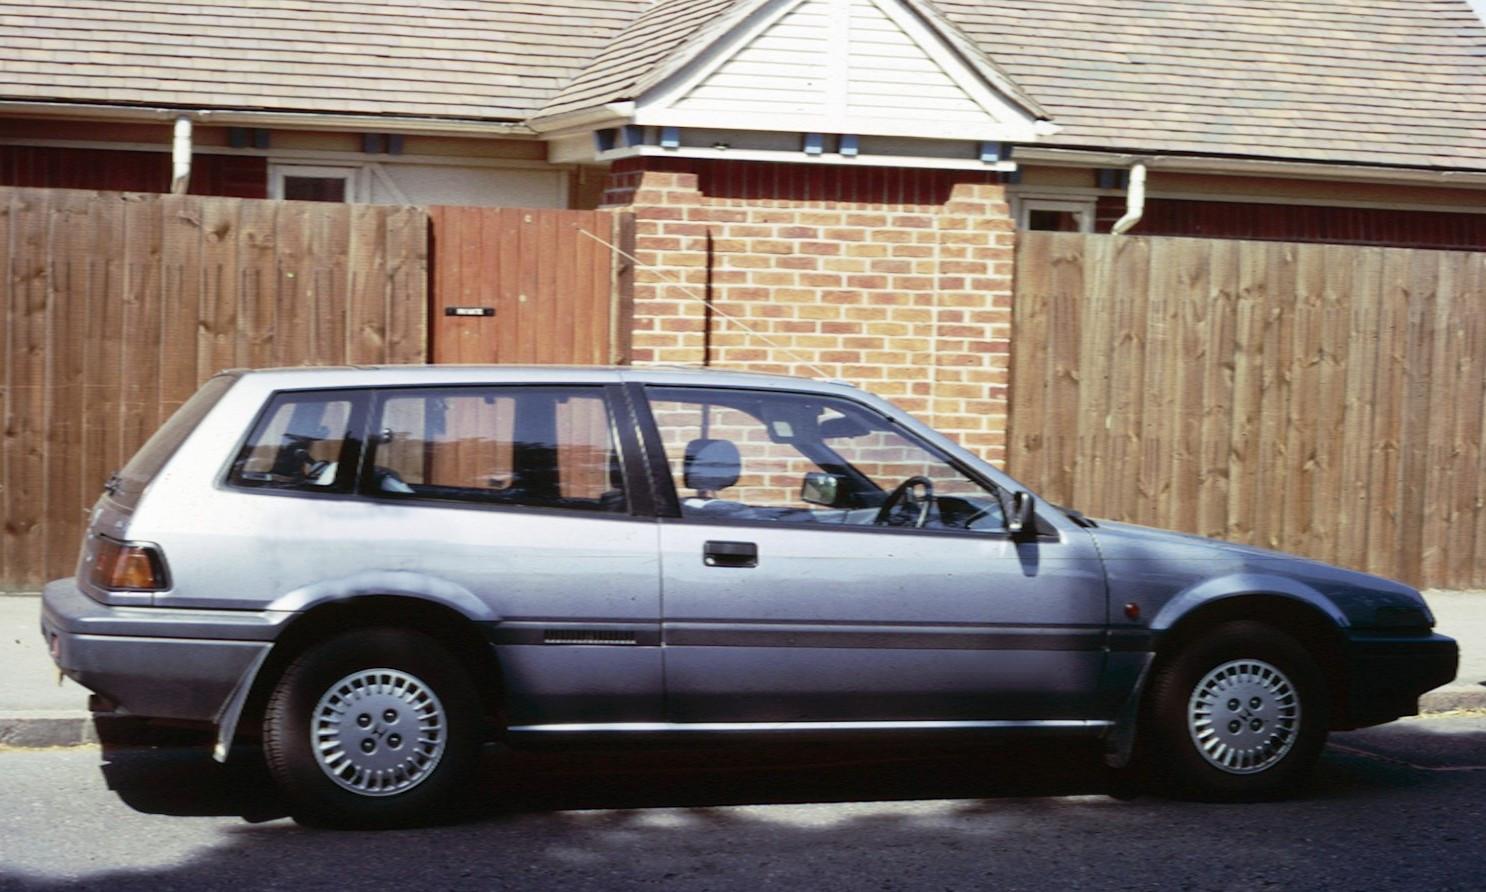 Honda_Accord_Aerodeck_Cambridge_1988.jpg